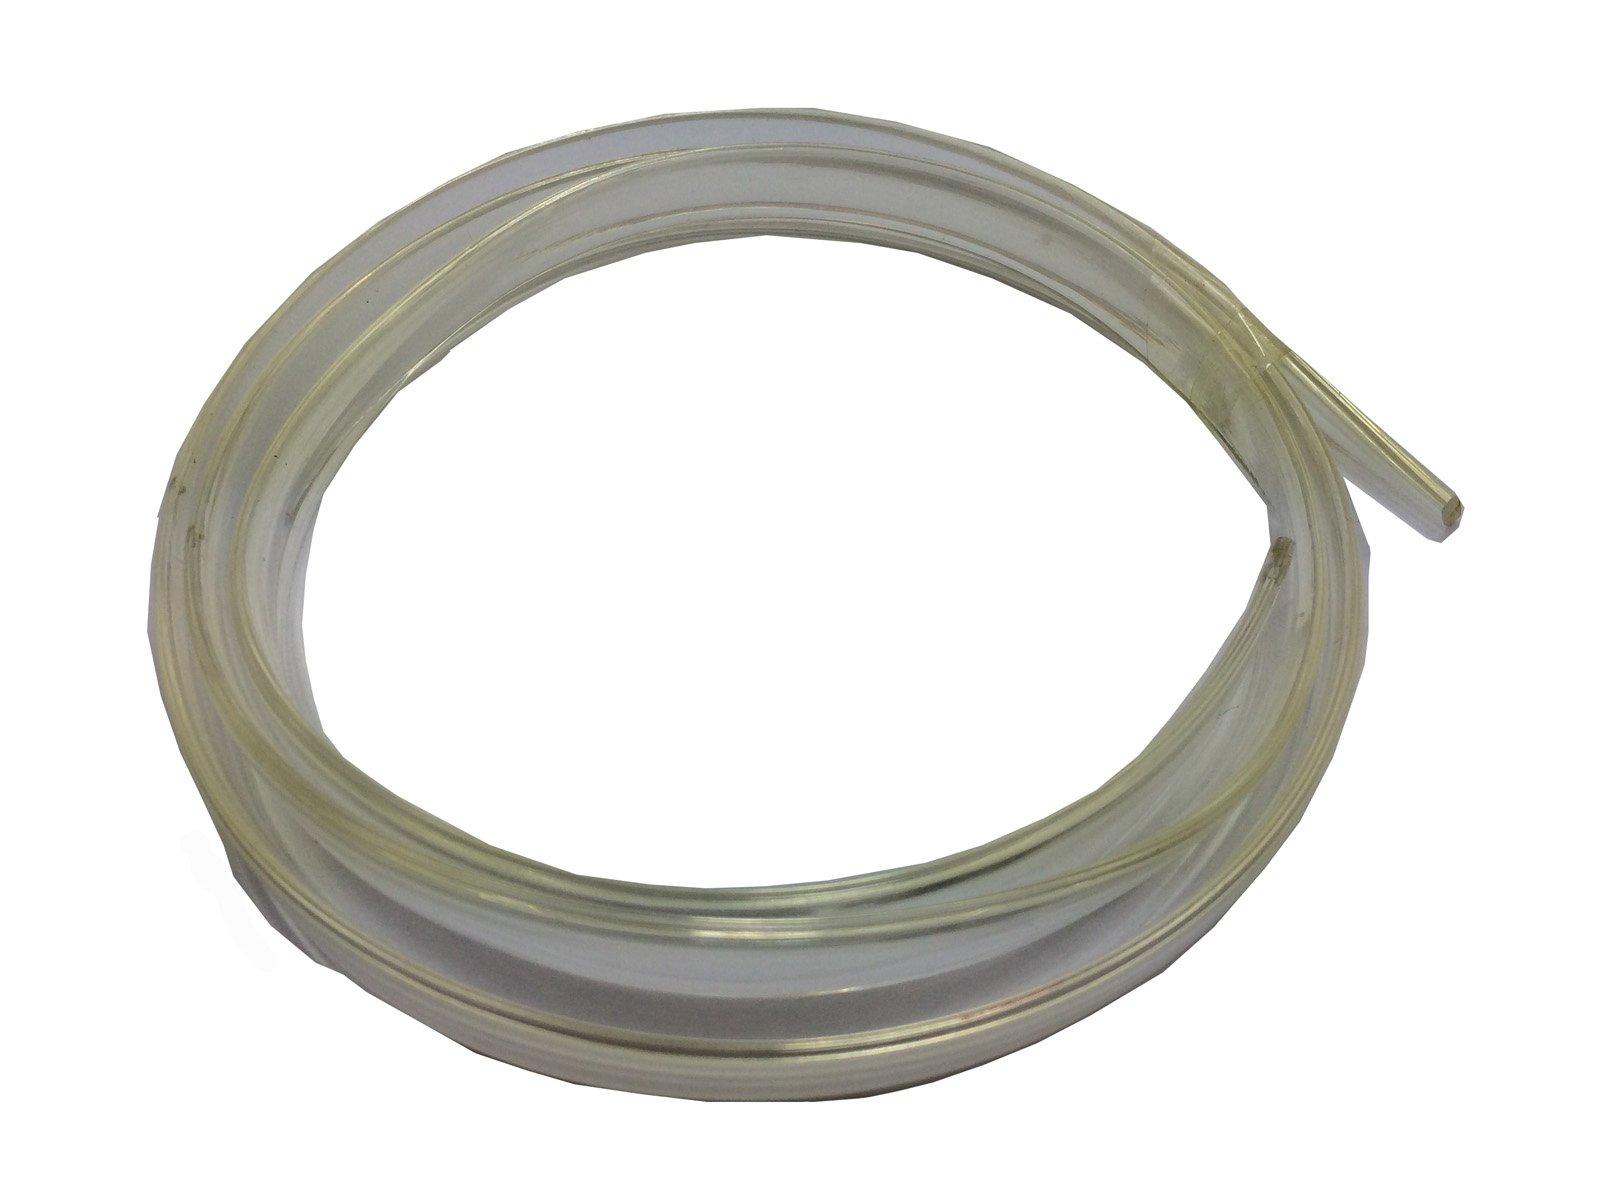 corpereal 2M Flat Side Glow Light Fiber Optic Cable